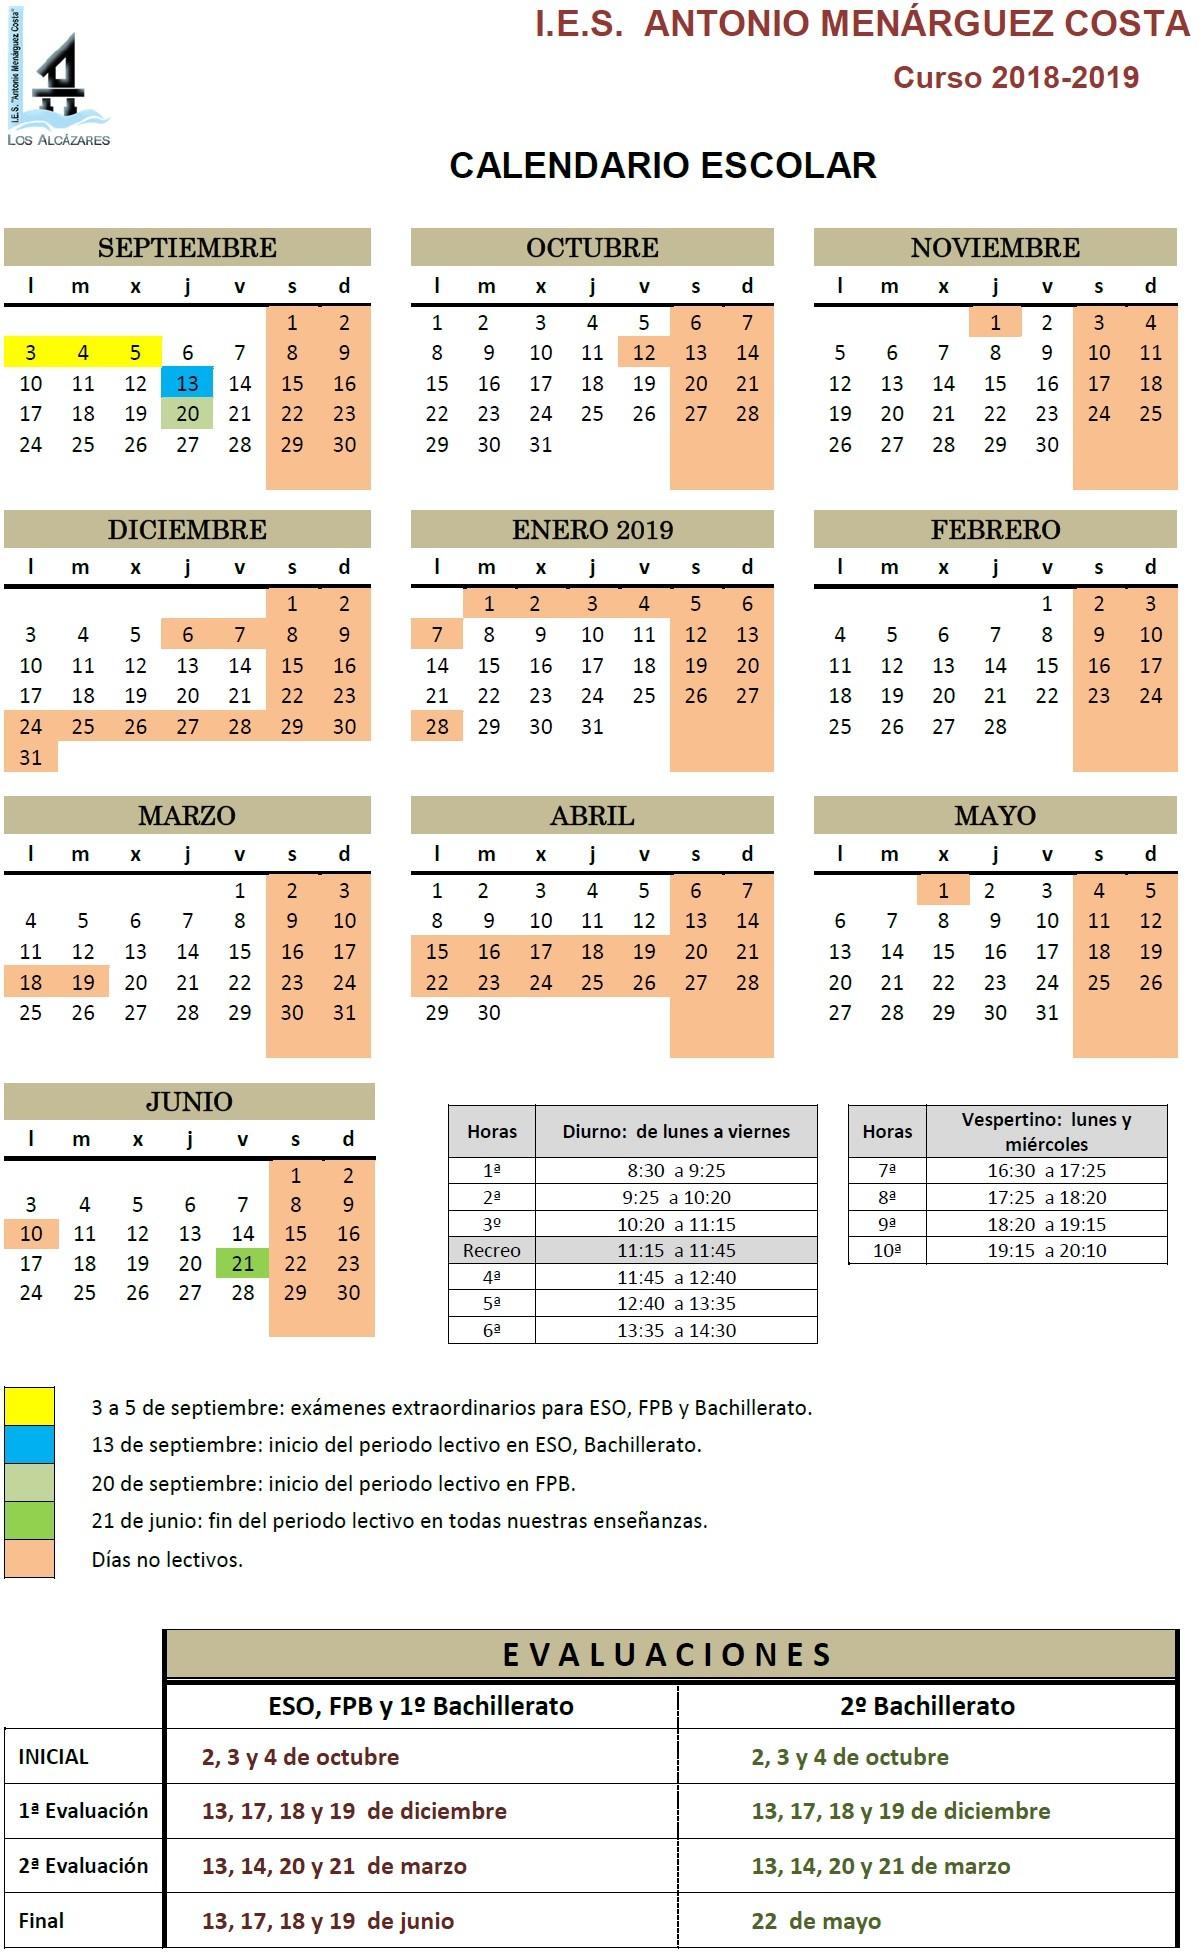 Calendario Escolar 2019 Jaen Más Arriba-a-fecha I E S Antonio Menrguez Costa Of Calendario Escolar 2019 Jaen Más Recientemente Liberado Horarios Del Curso 2018 2019 – I E S Fuente De La Pe±a